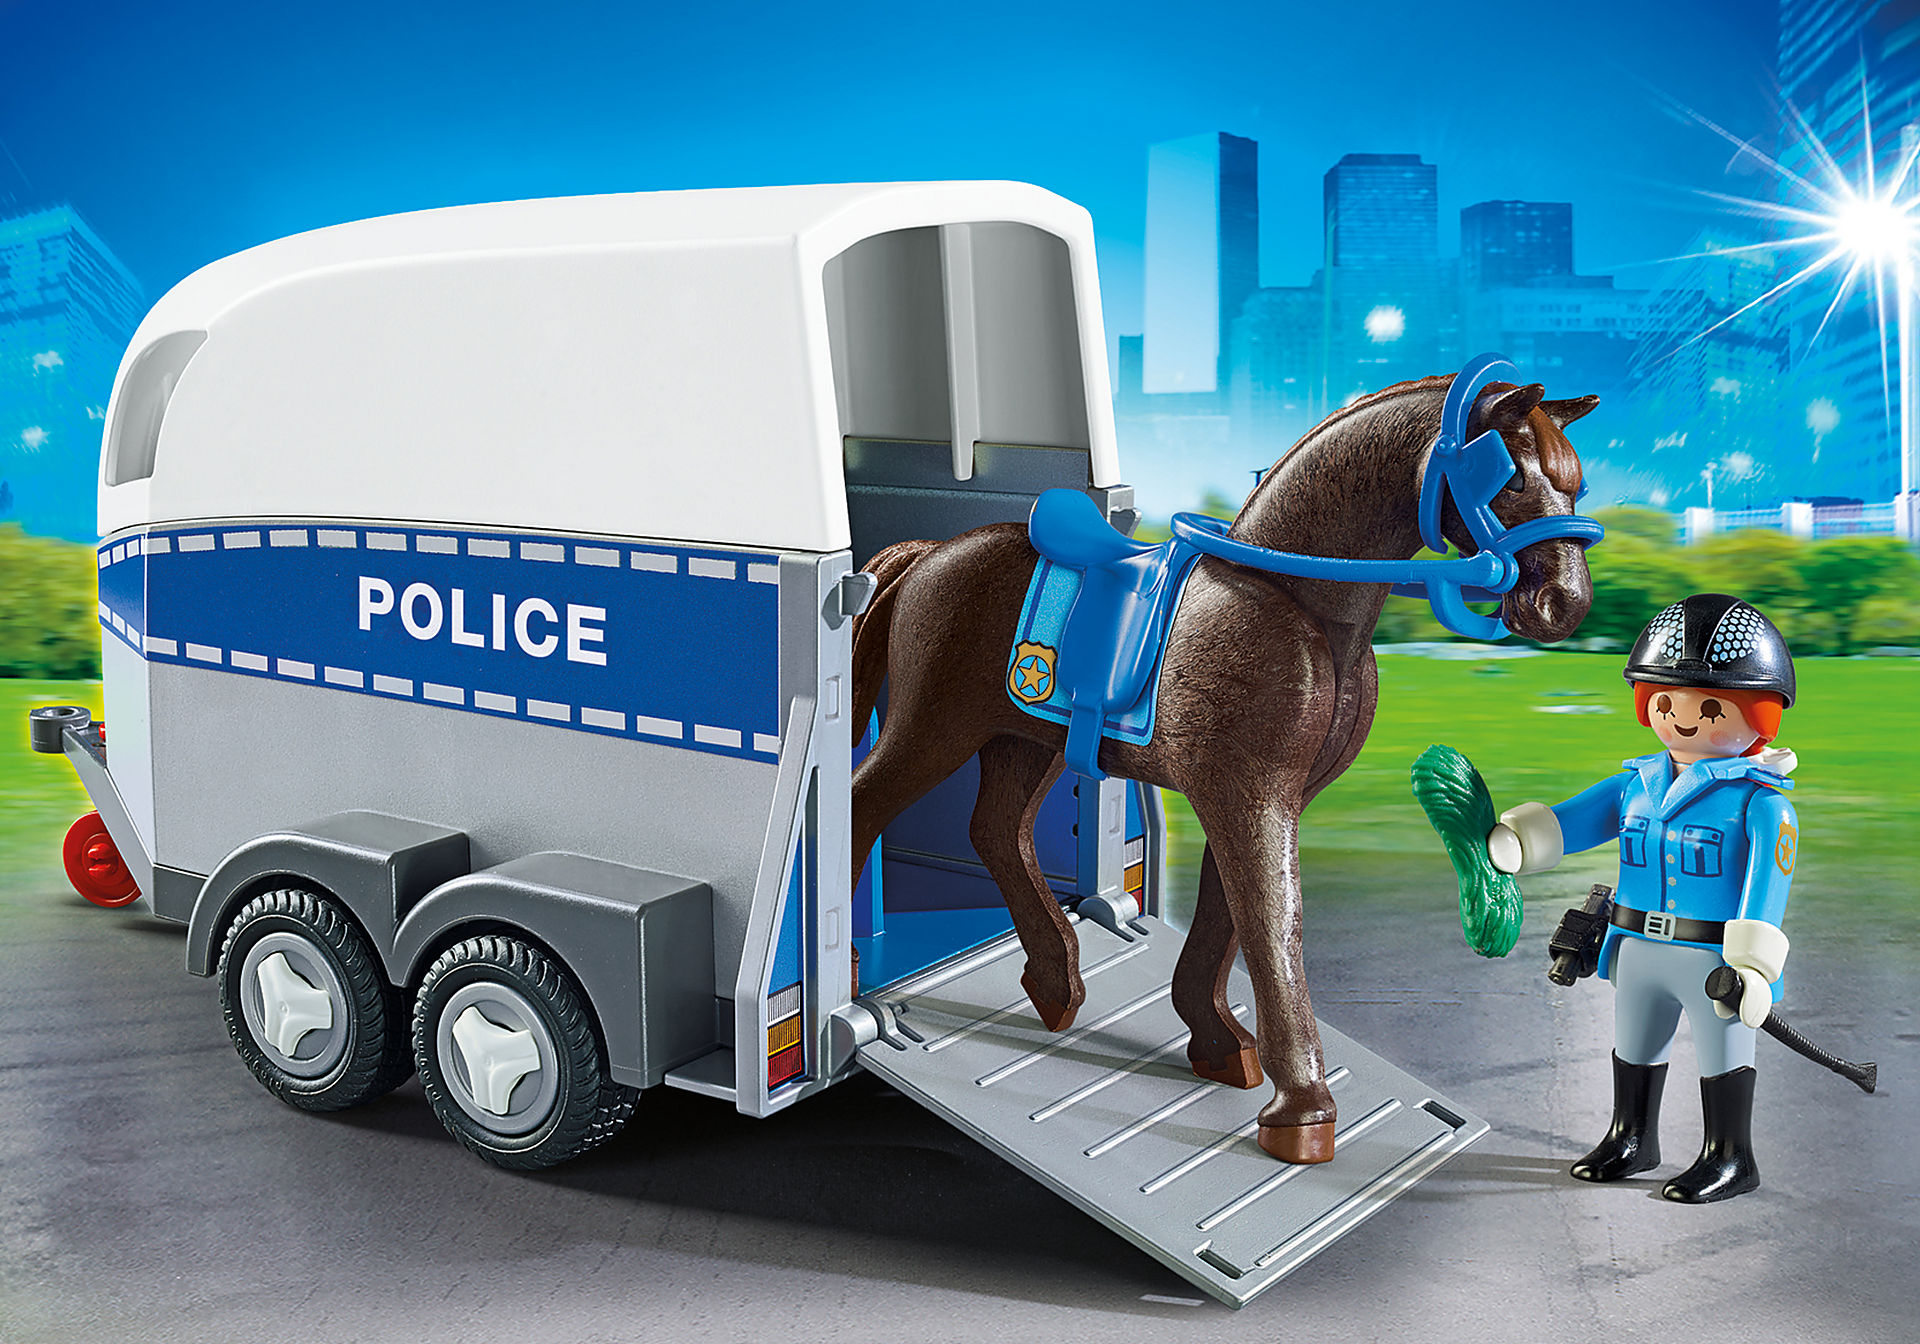 http://media.playmobil.com/i/playmobil/6922_product_detail/Policière avec cheval et remorque